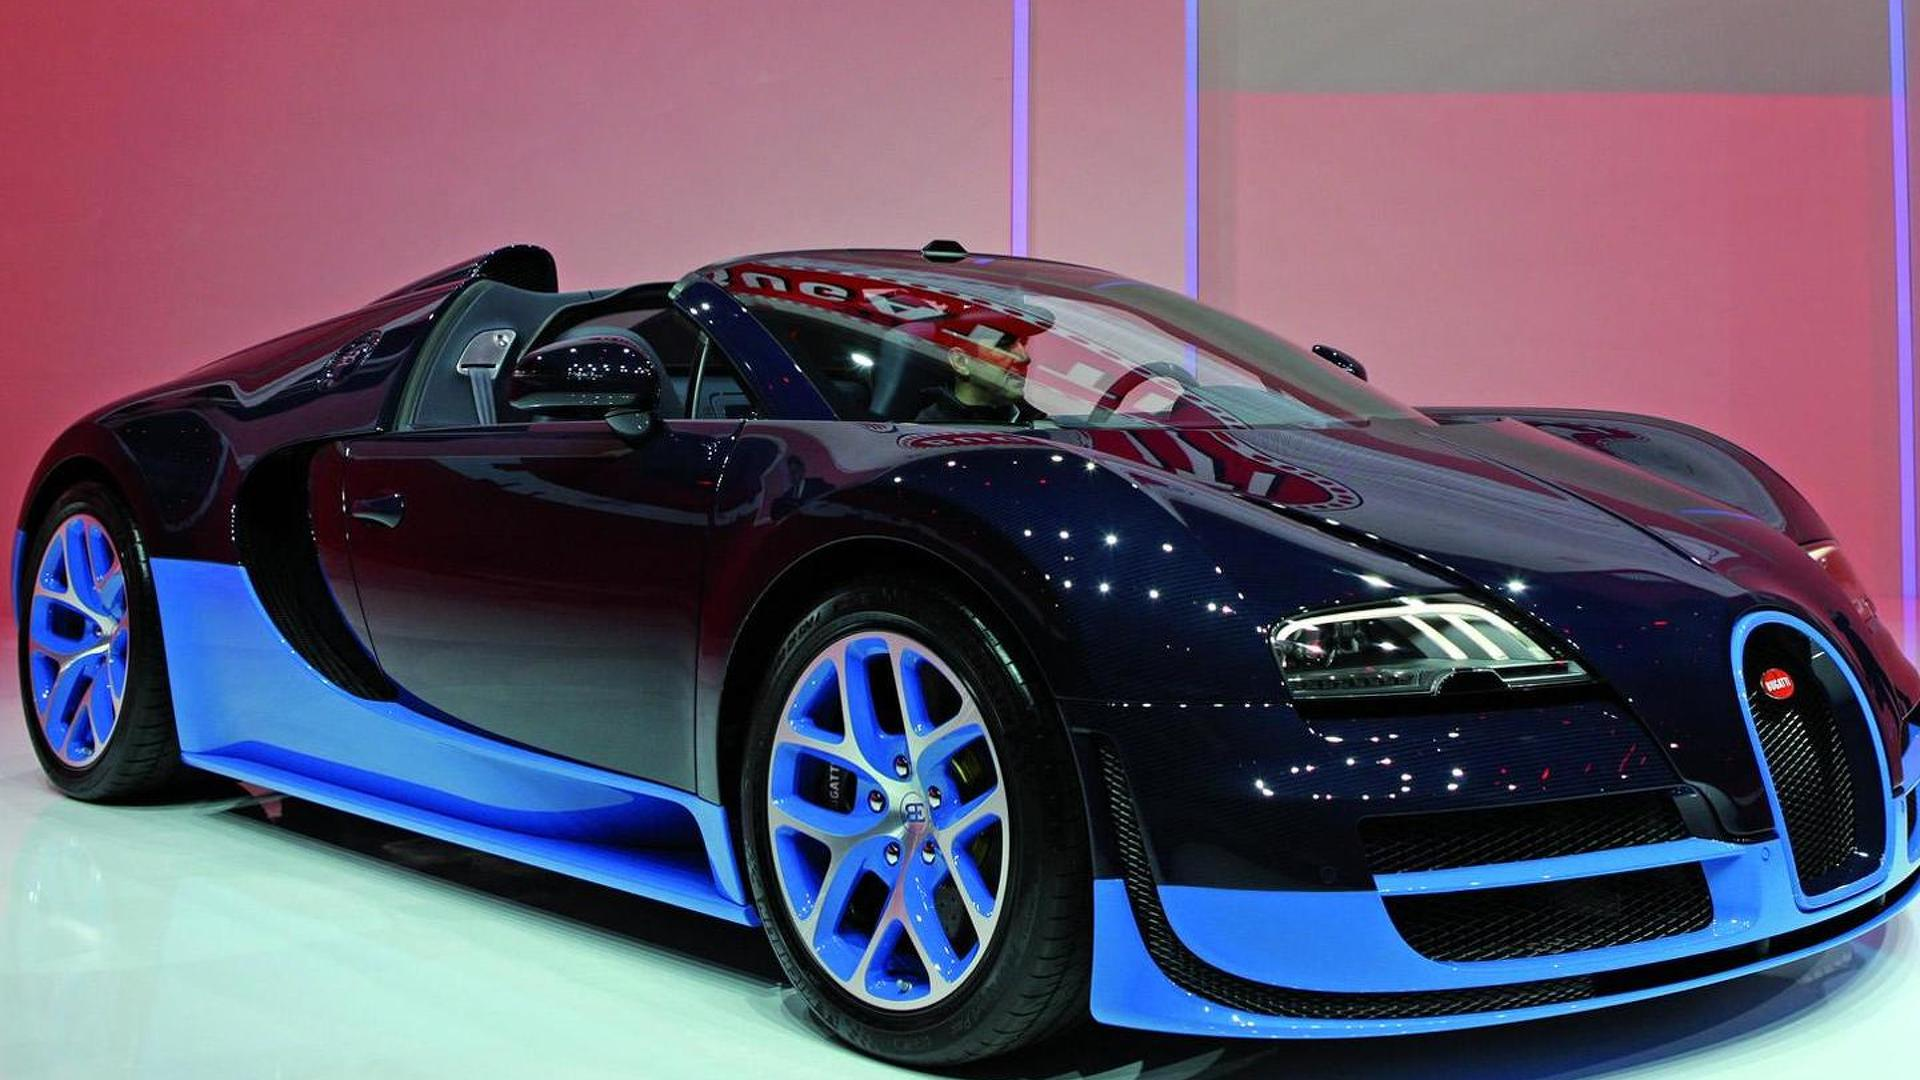 2012-301417-bugatti-veyron-grand-sport-vitesse-presentation-in-geneva1 Remarkable Bugatti Veyron Grand Sport Vitesse Black and Blue Cars Trend